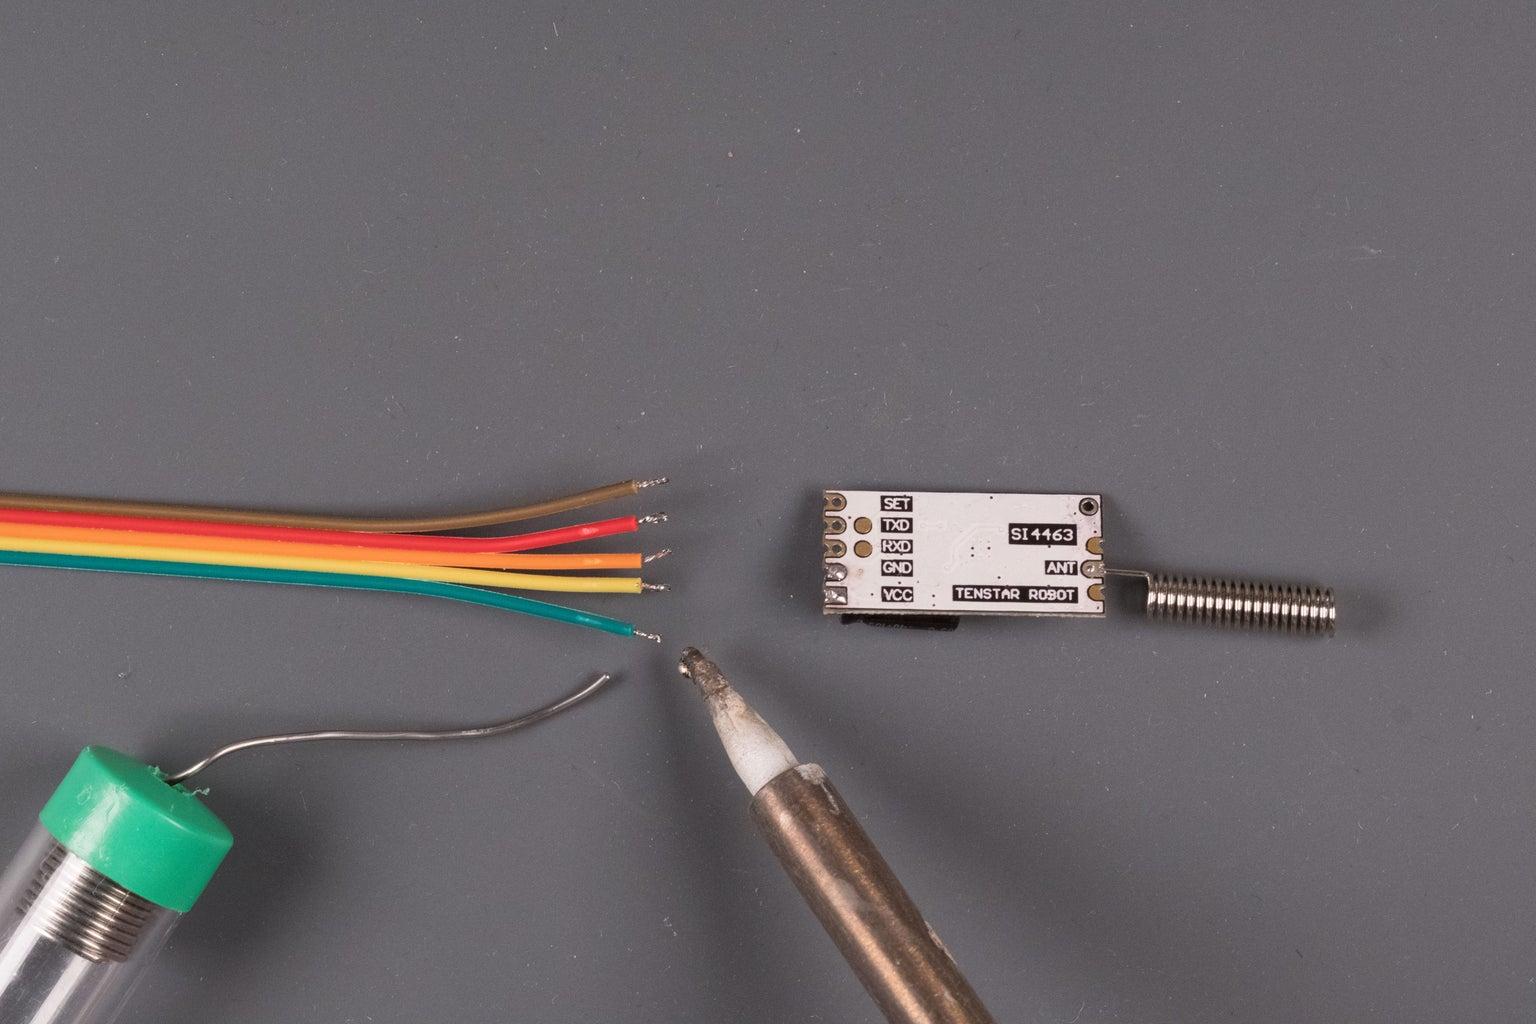 Tutorial 1 - ESP32 Based RF Sensor Hub